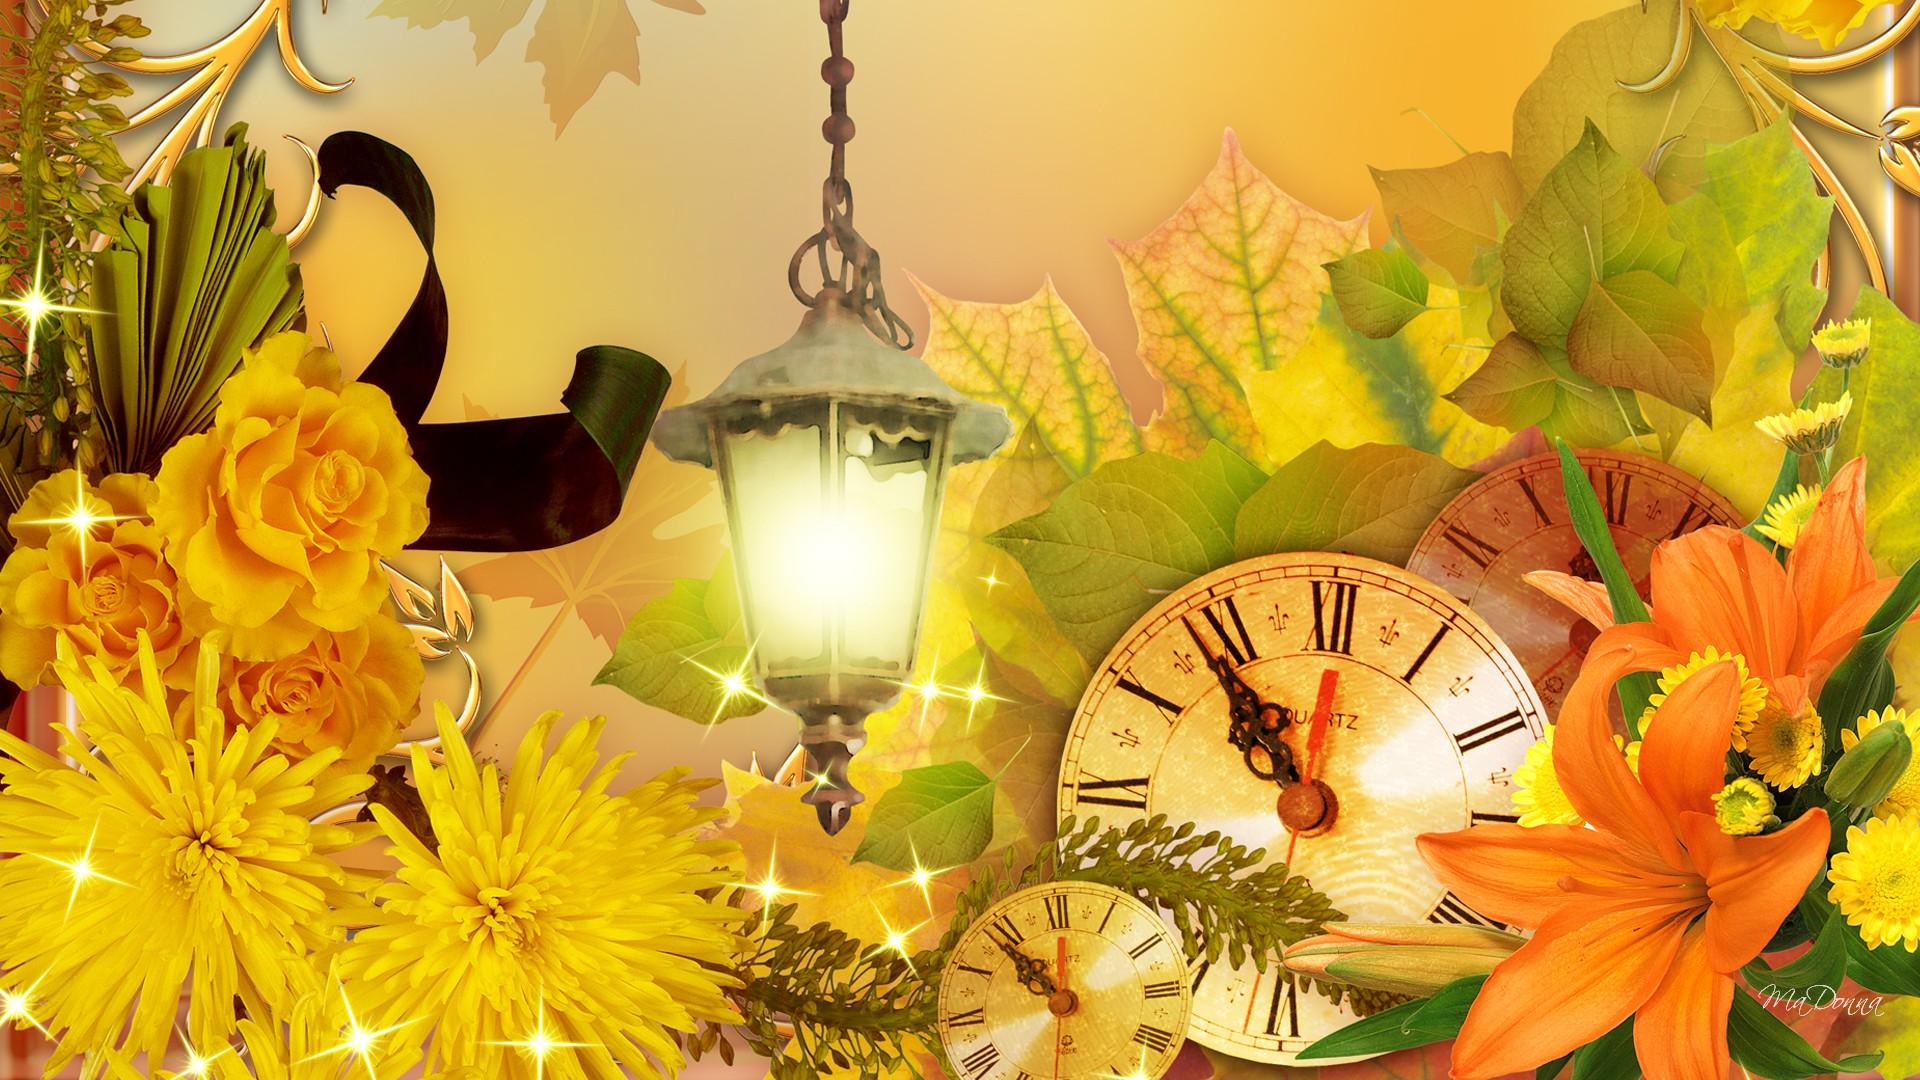 tiempo de flores de otoo fondo de pantalla   ForWallpapercom 1920x1080